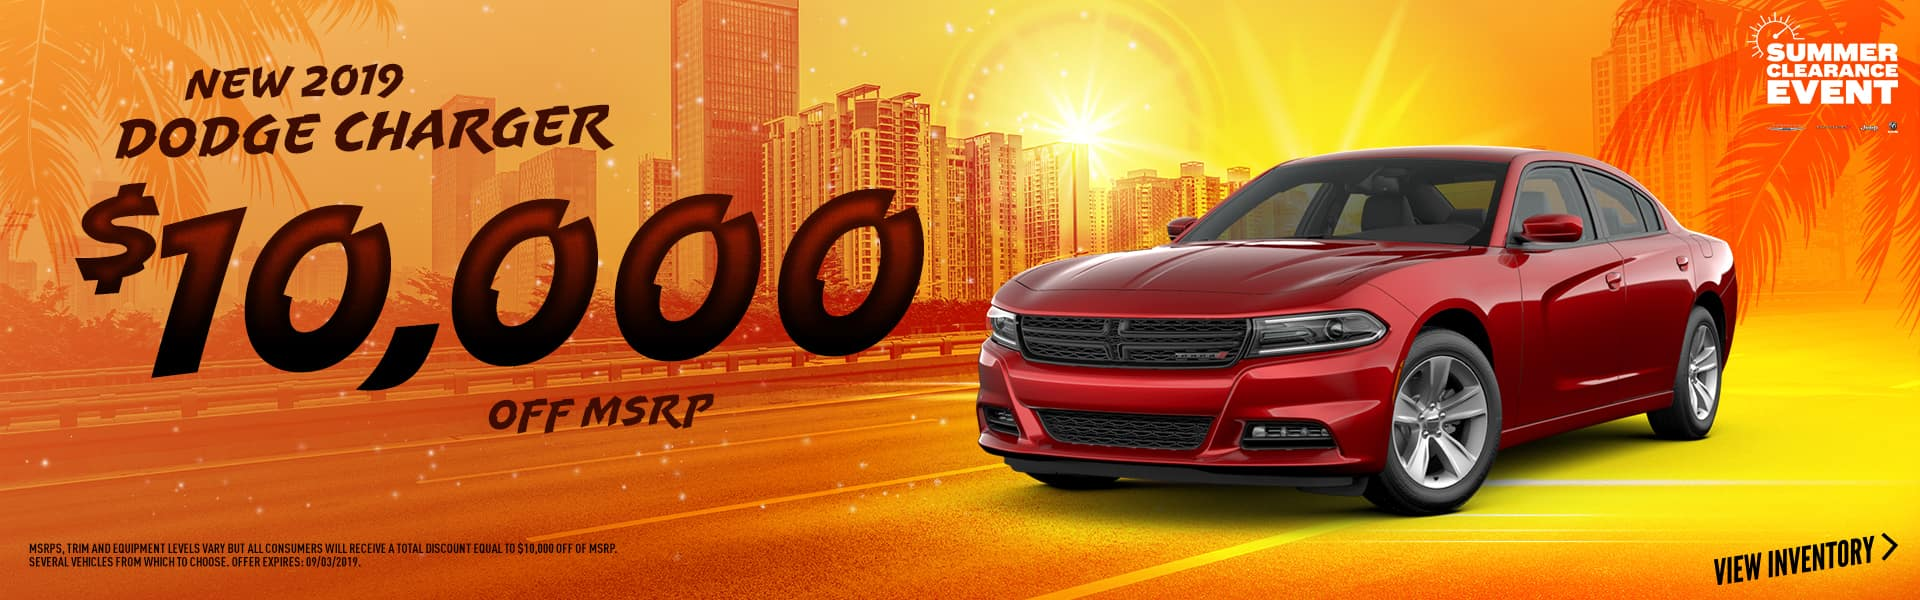 10000-off-msrp-on-2019-dodge-charger-tulsa